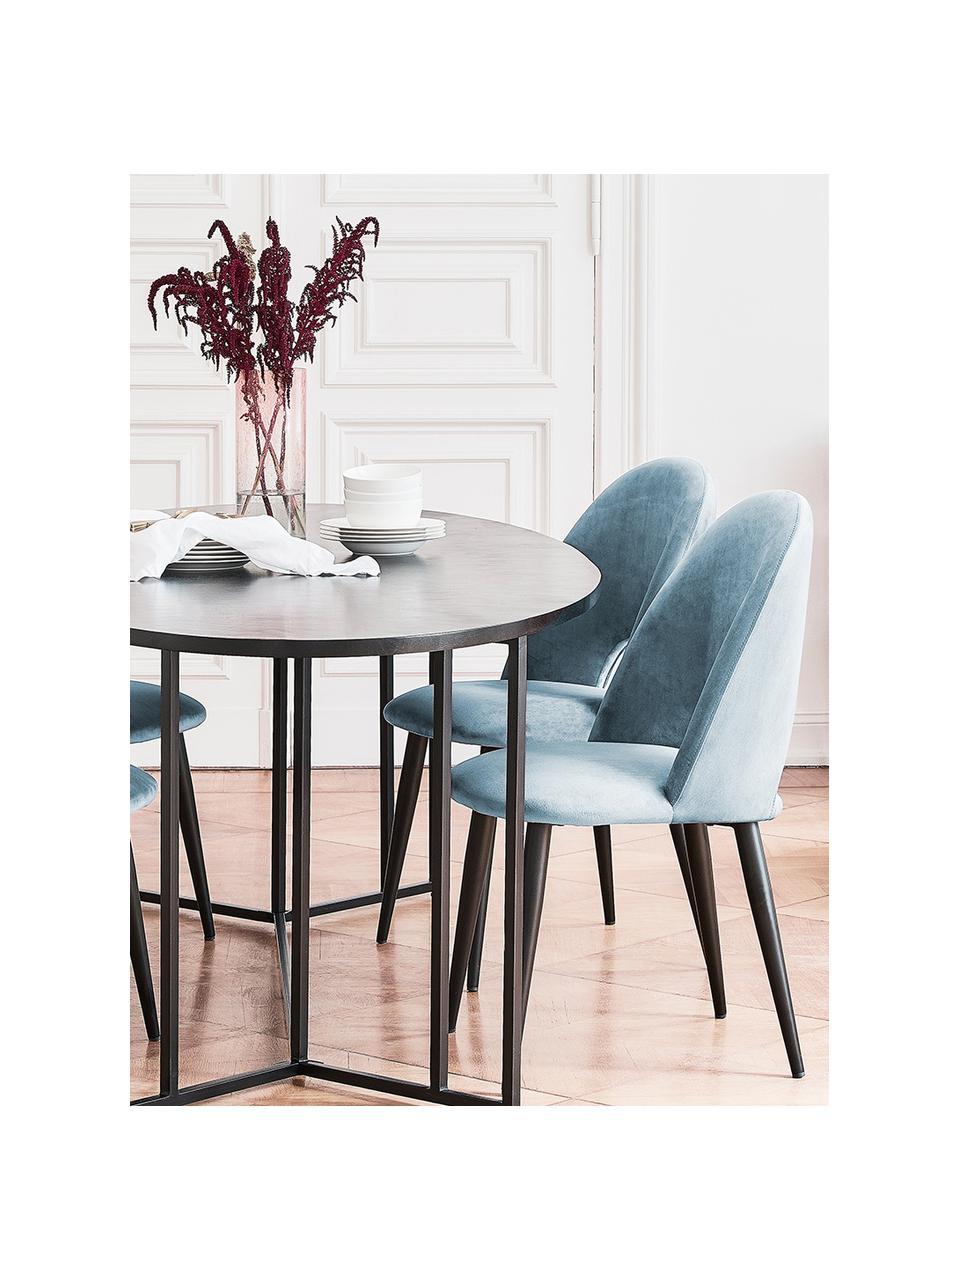 Sedia imbottita in velluto blu Rachel, Rivestimento: velluto (rivestimento in , Gambe: metallo verniciato a polv, Velluto azzurro, Larg. 53 x Prof. 57 cm